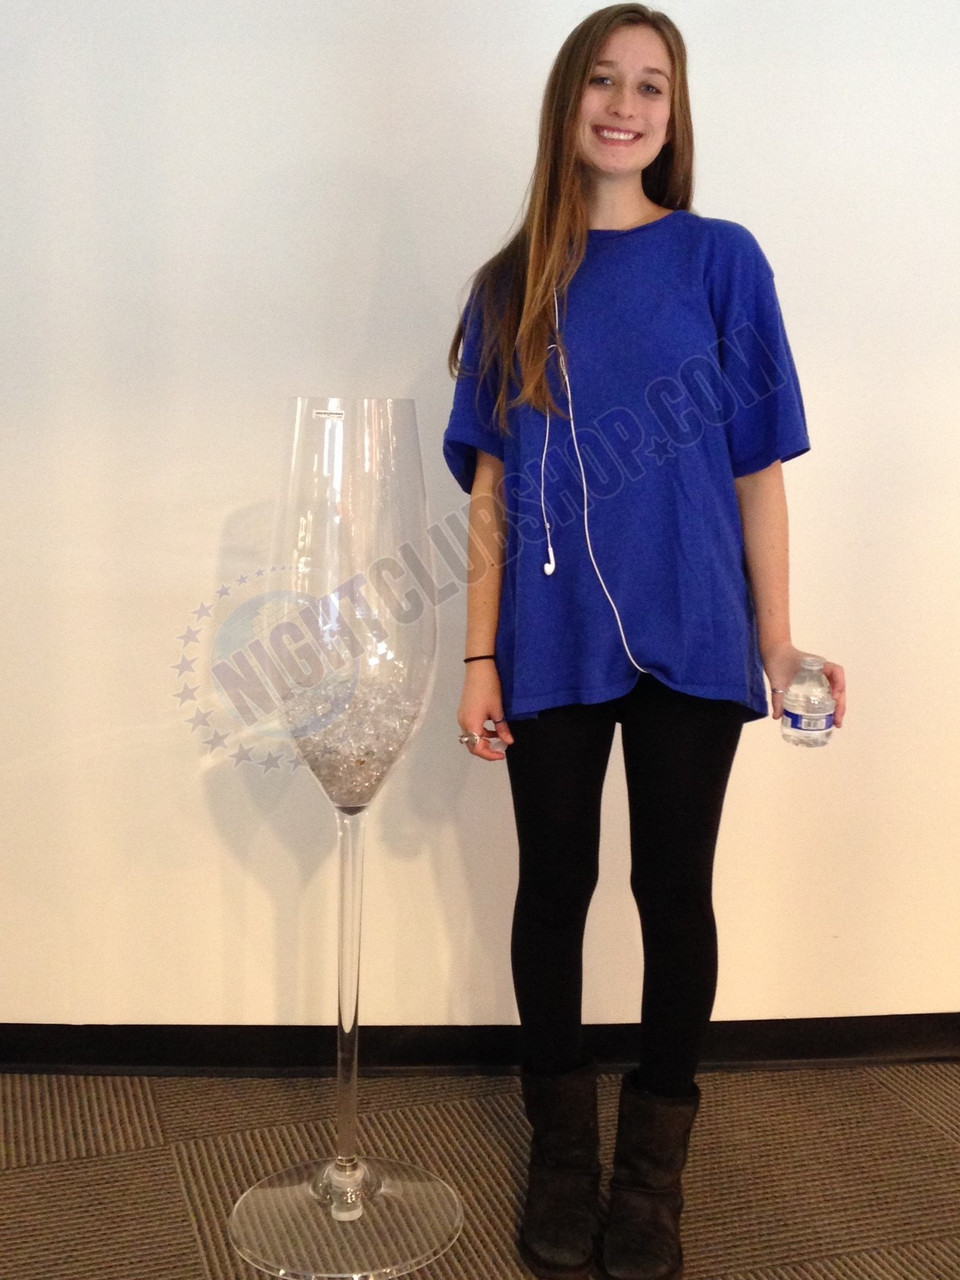 XL, Jumbo, Large, Champagne, Flute, Bottle, Acrylic, Cup, Actual-size, Huge, Enormous, Gigantic, glassware, Celebration